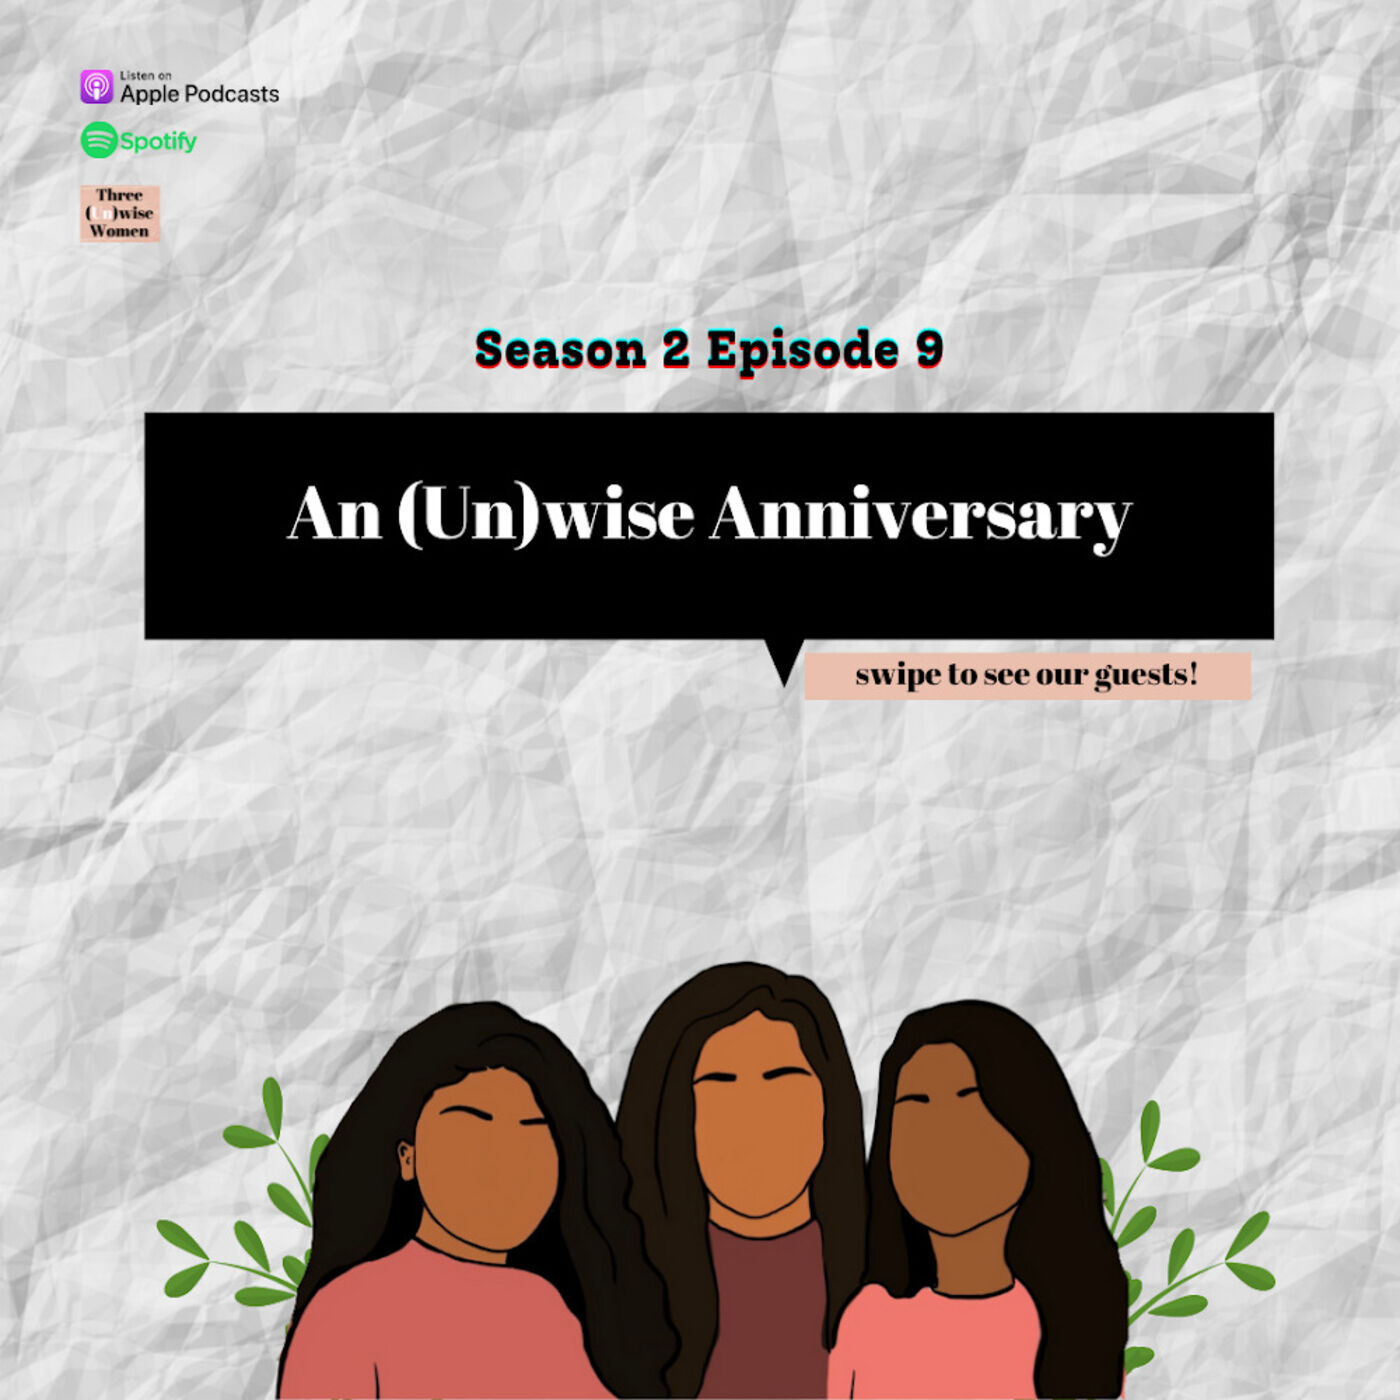 An (Un)wise Anniversary